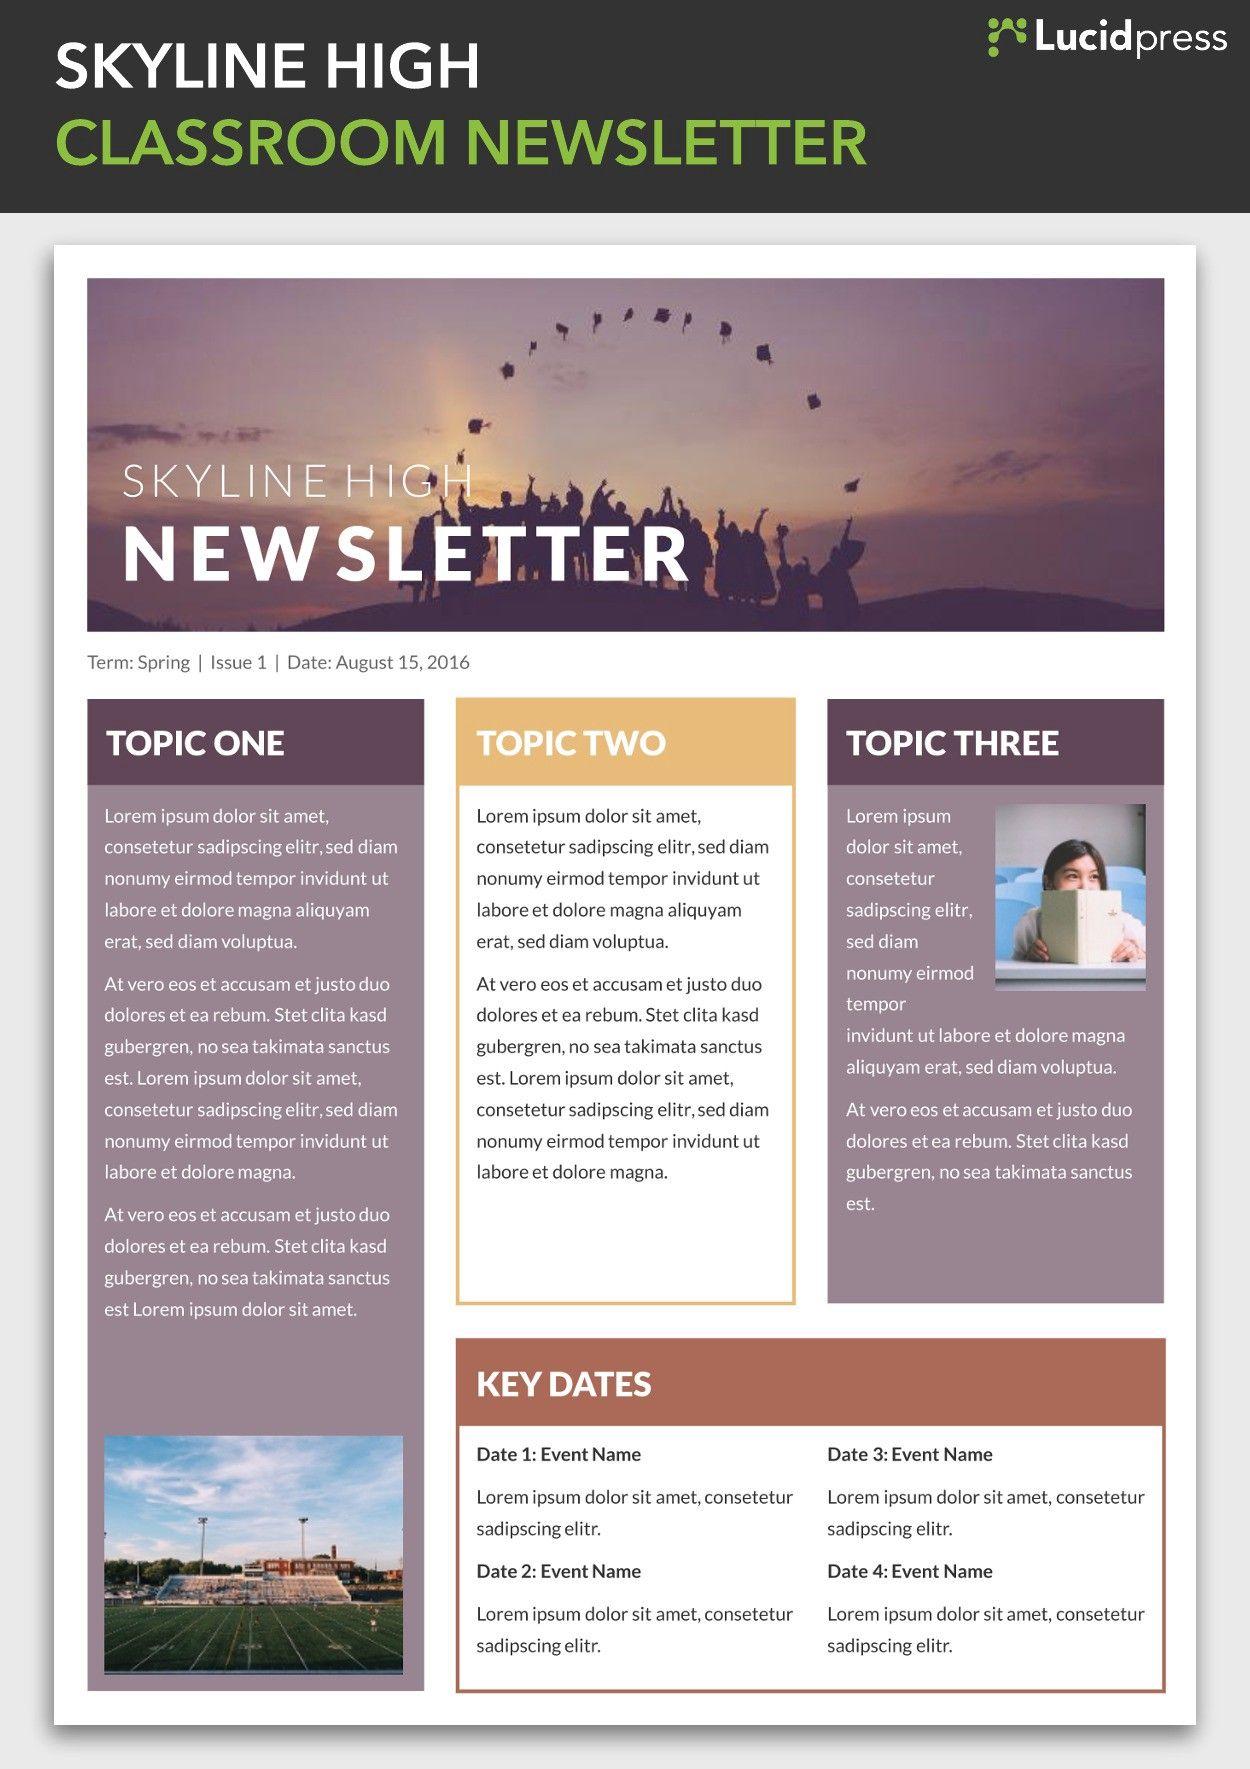 13 Best Newsletter Design Ideas Choosing The Right Newsletter Design By L Classroom Newsletter Template School Newsletter Template Newsletter Template Free